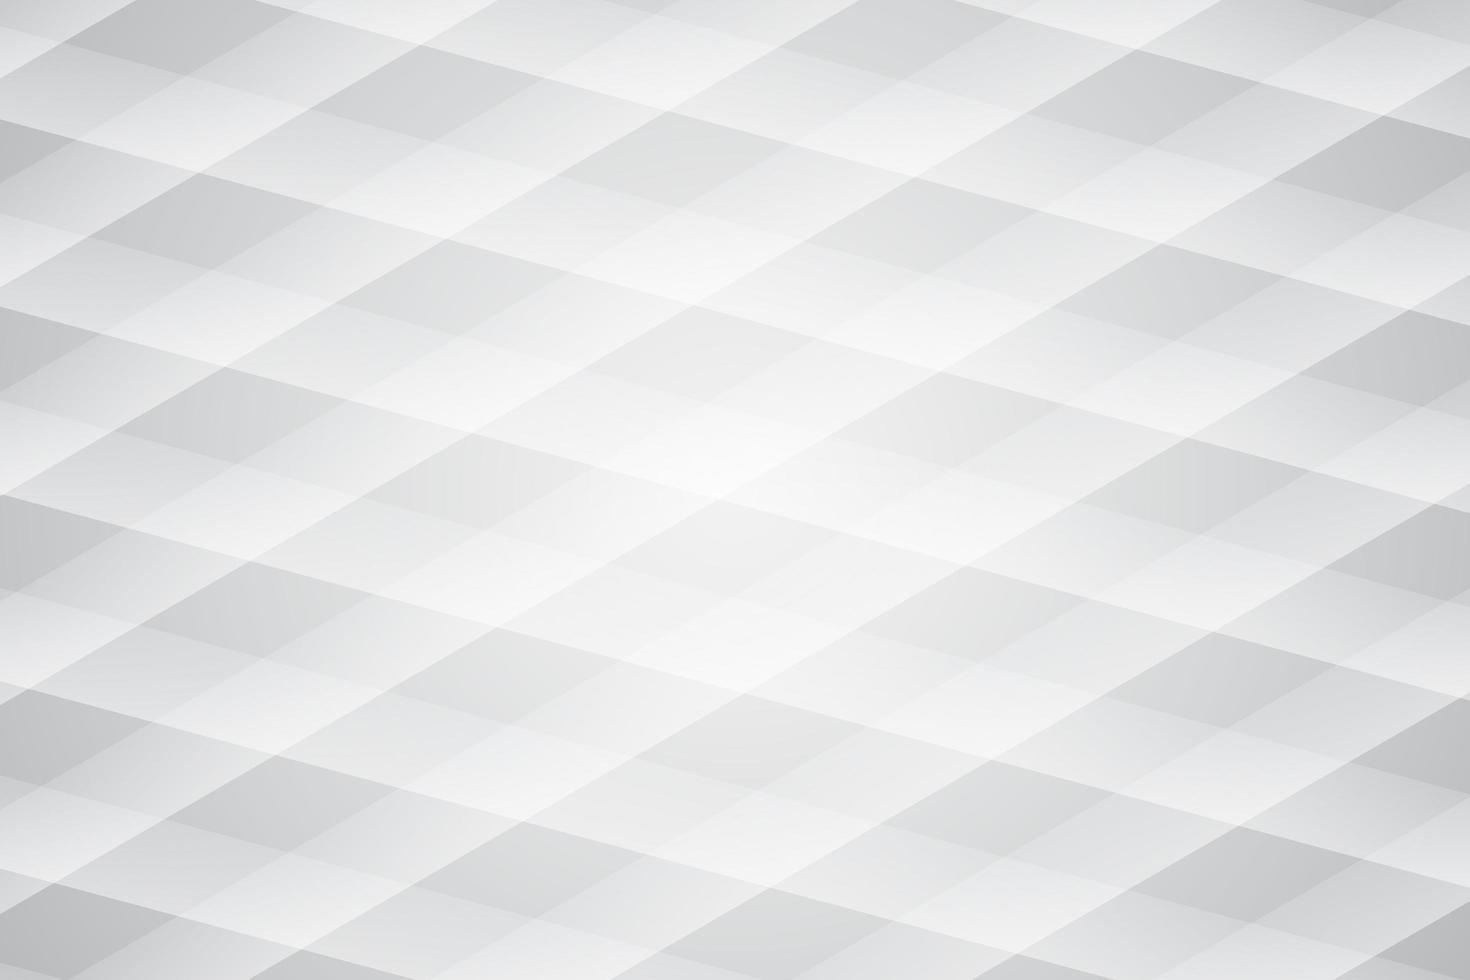 abstracte witte moderne naadloze witte achtergrond vector